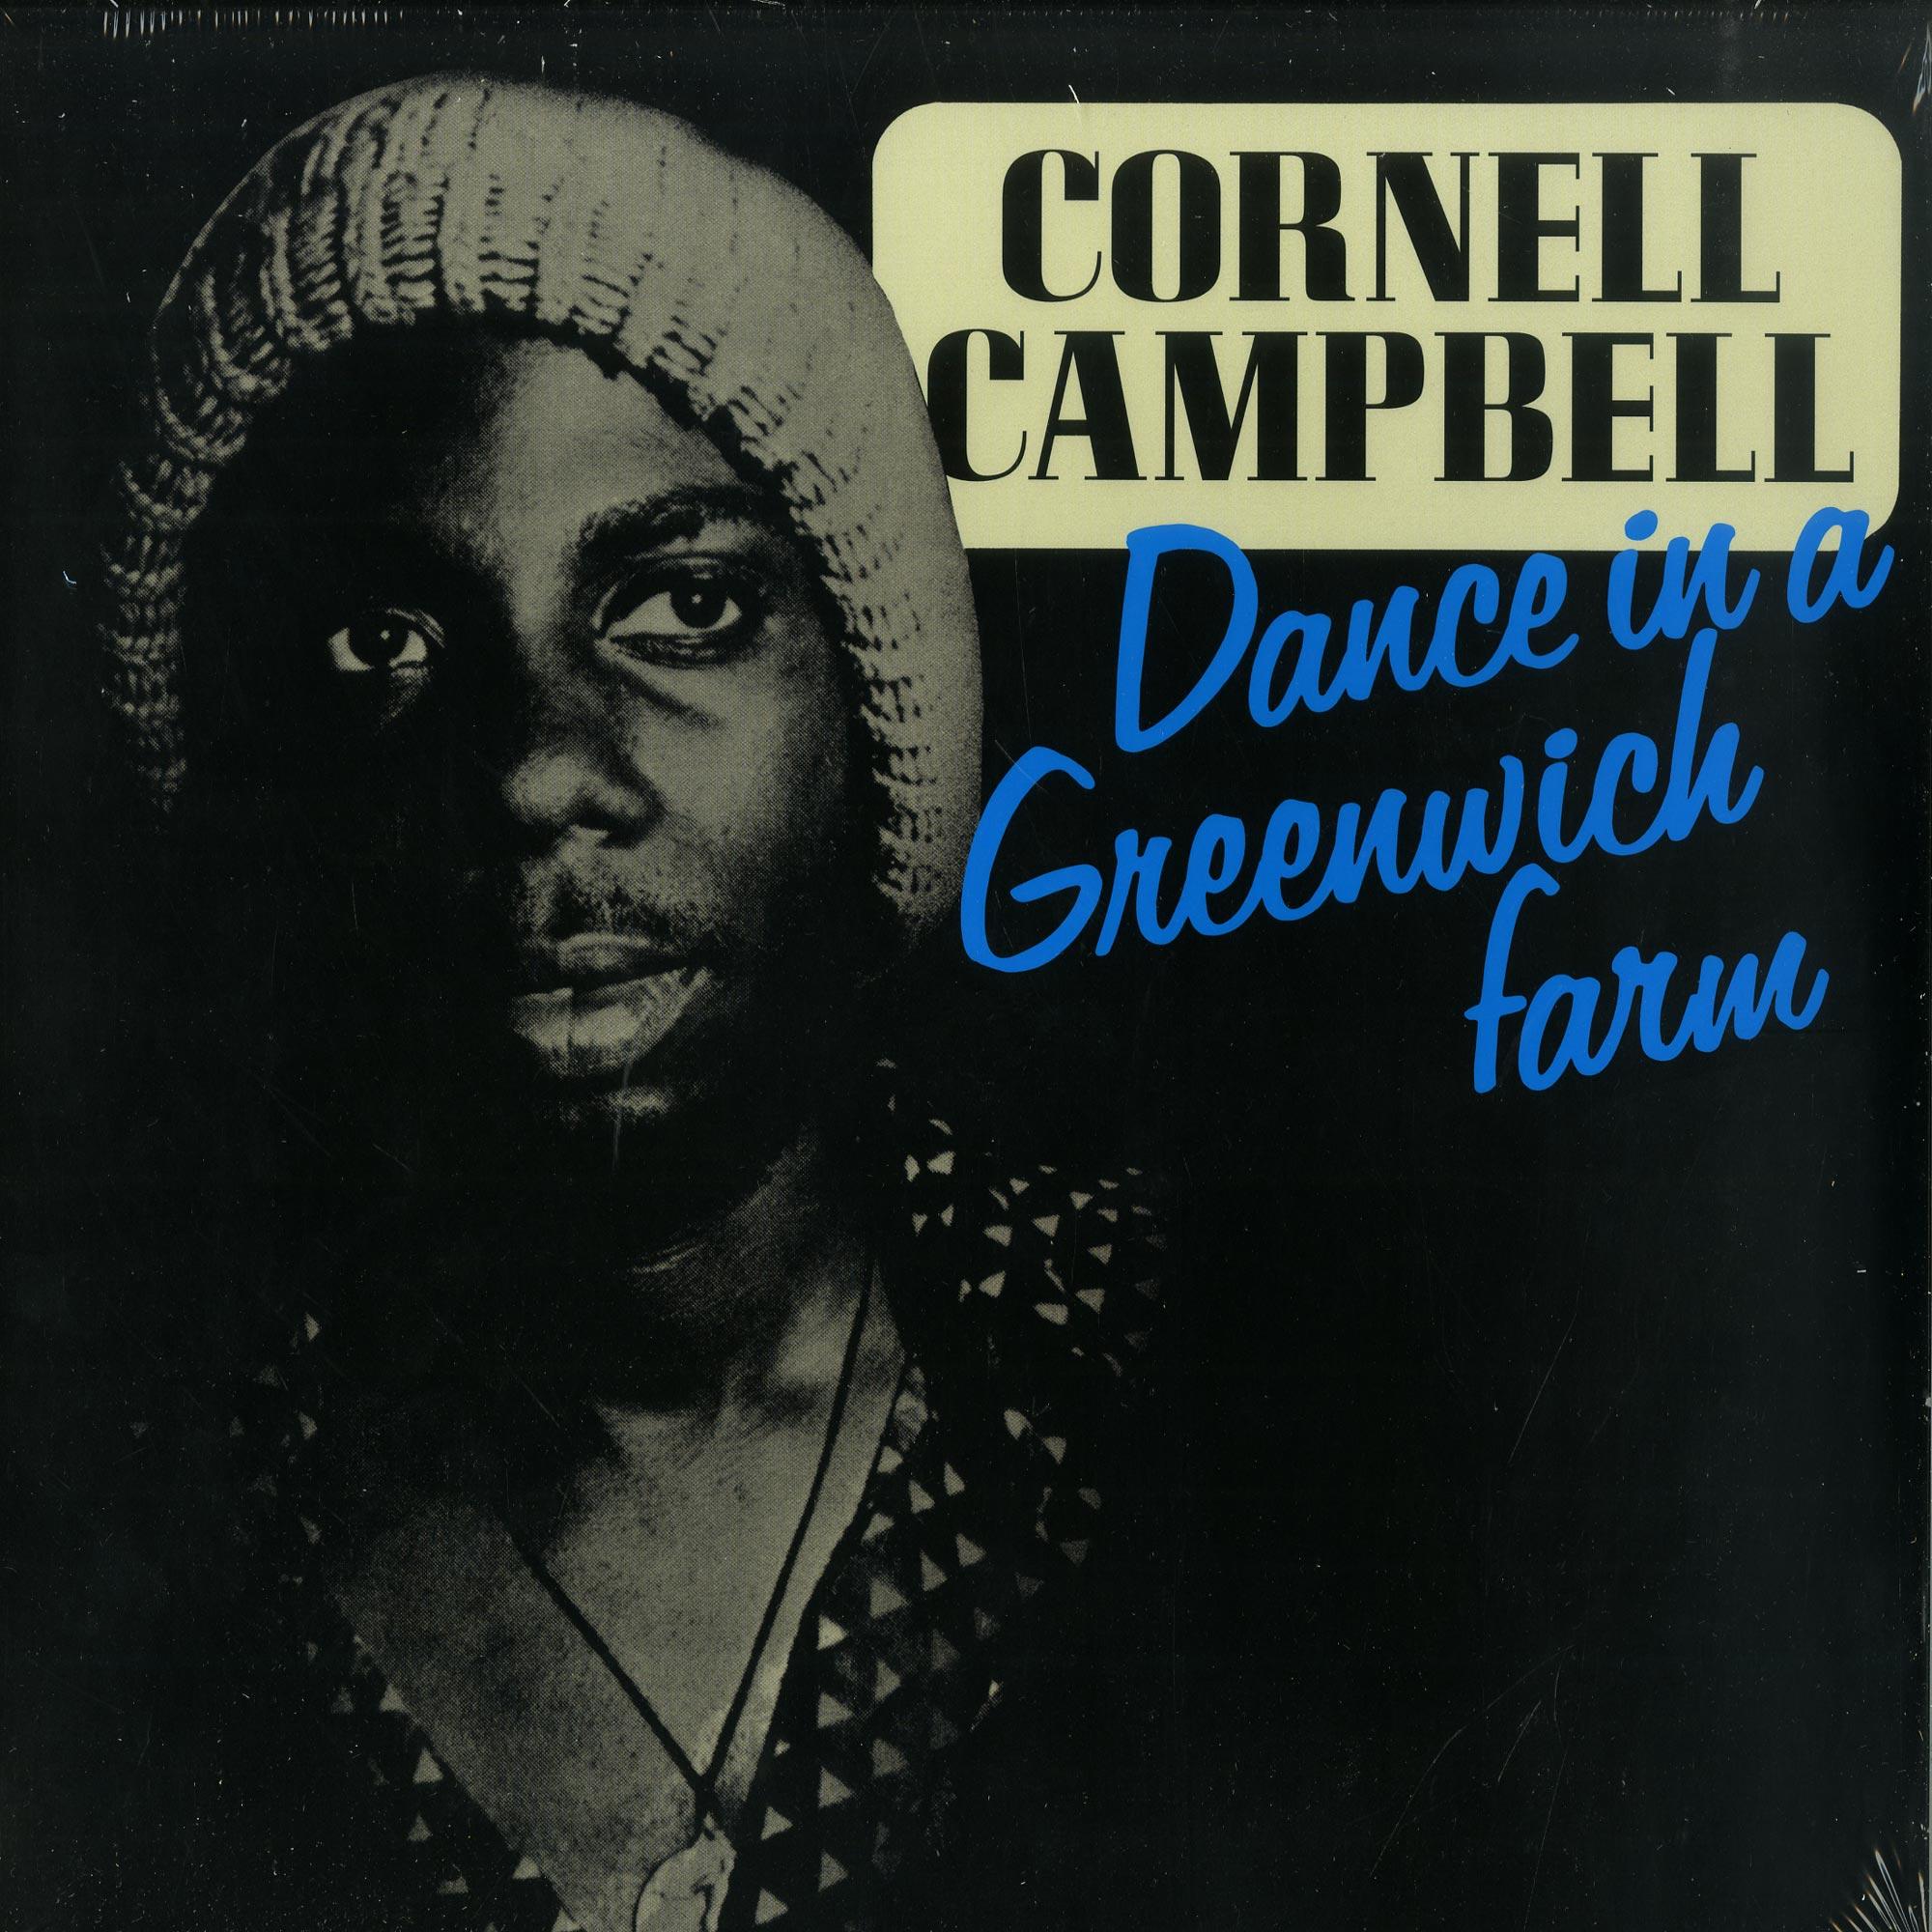 Cornell Campbell - DANCE IN A GREENWICH FARM